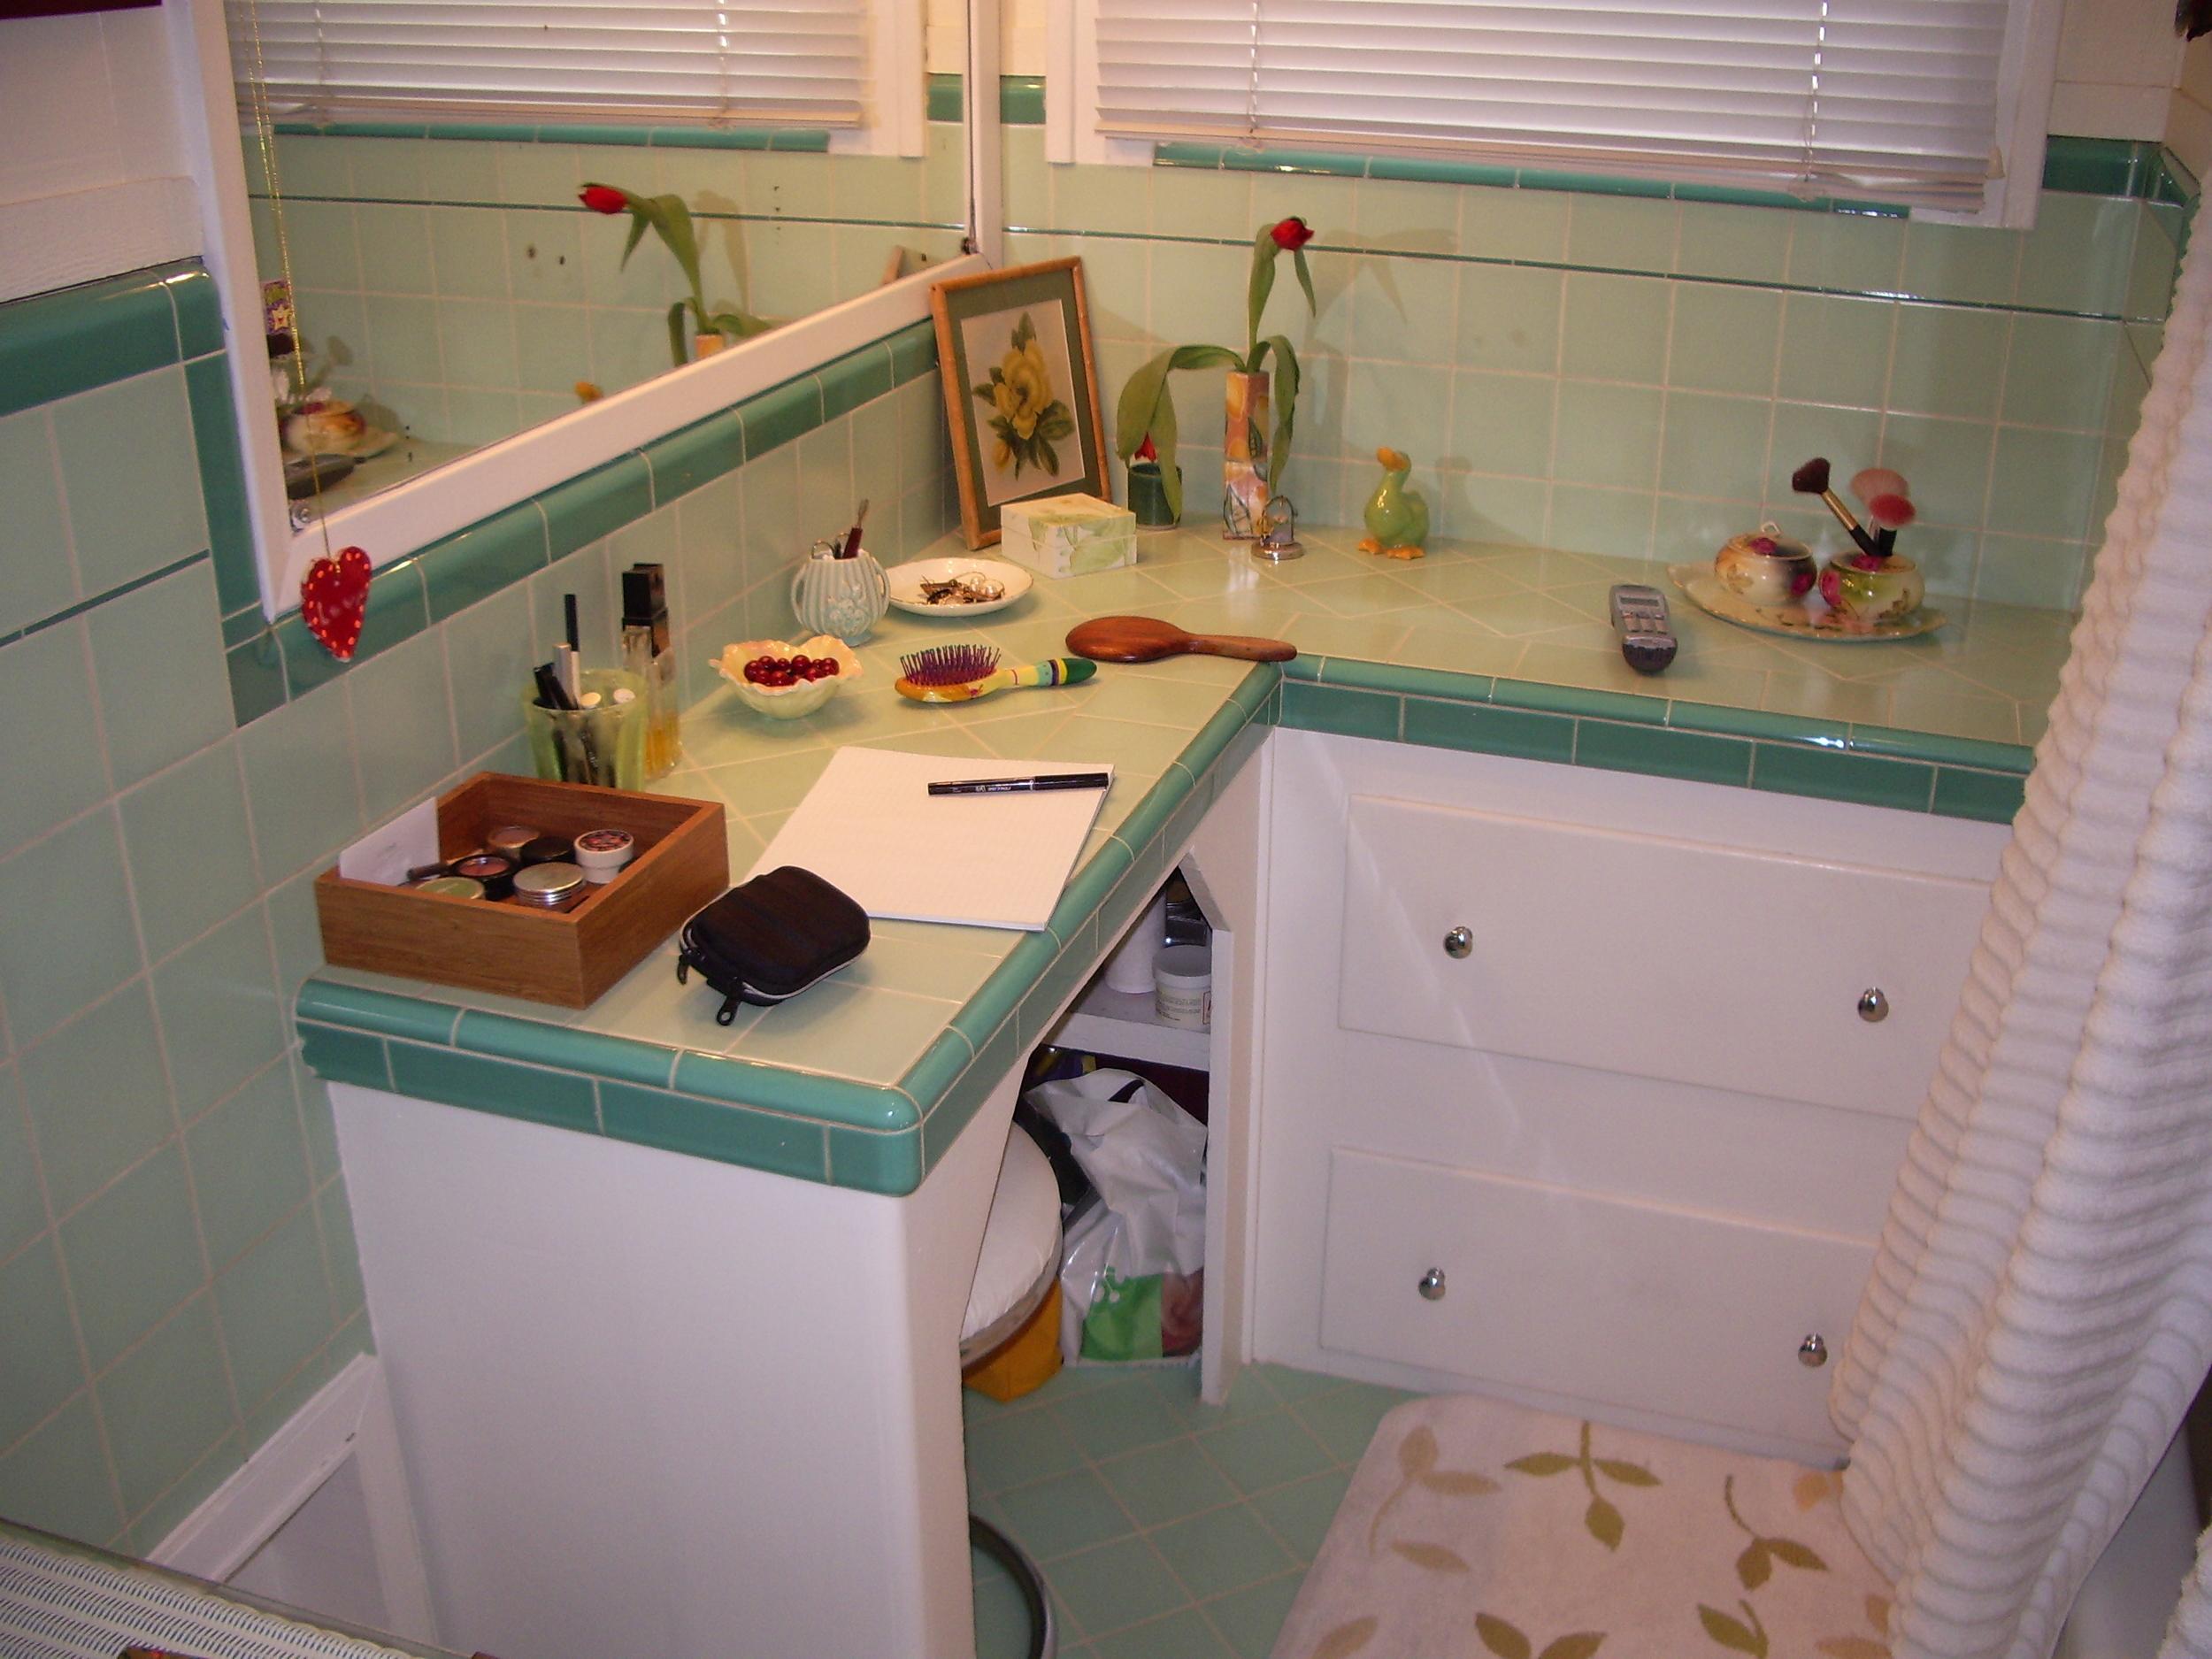 EAB Point Loma Bathroom Remodel 1.JPG